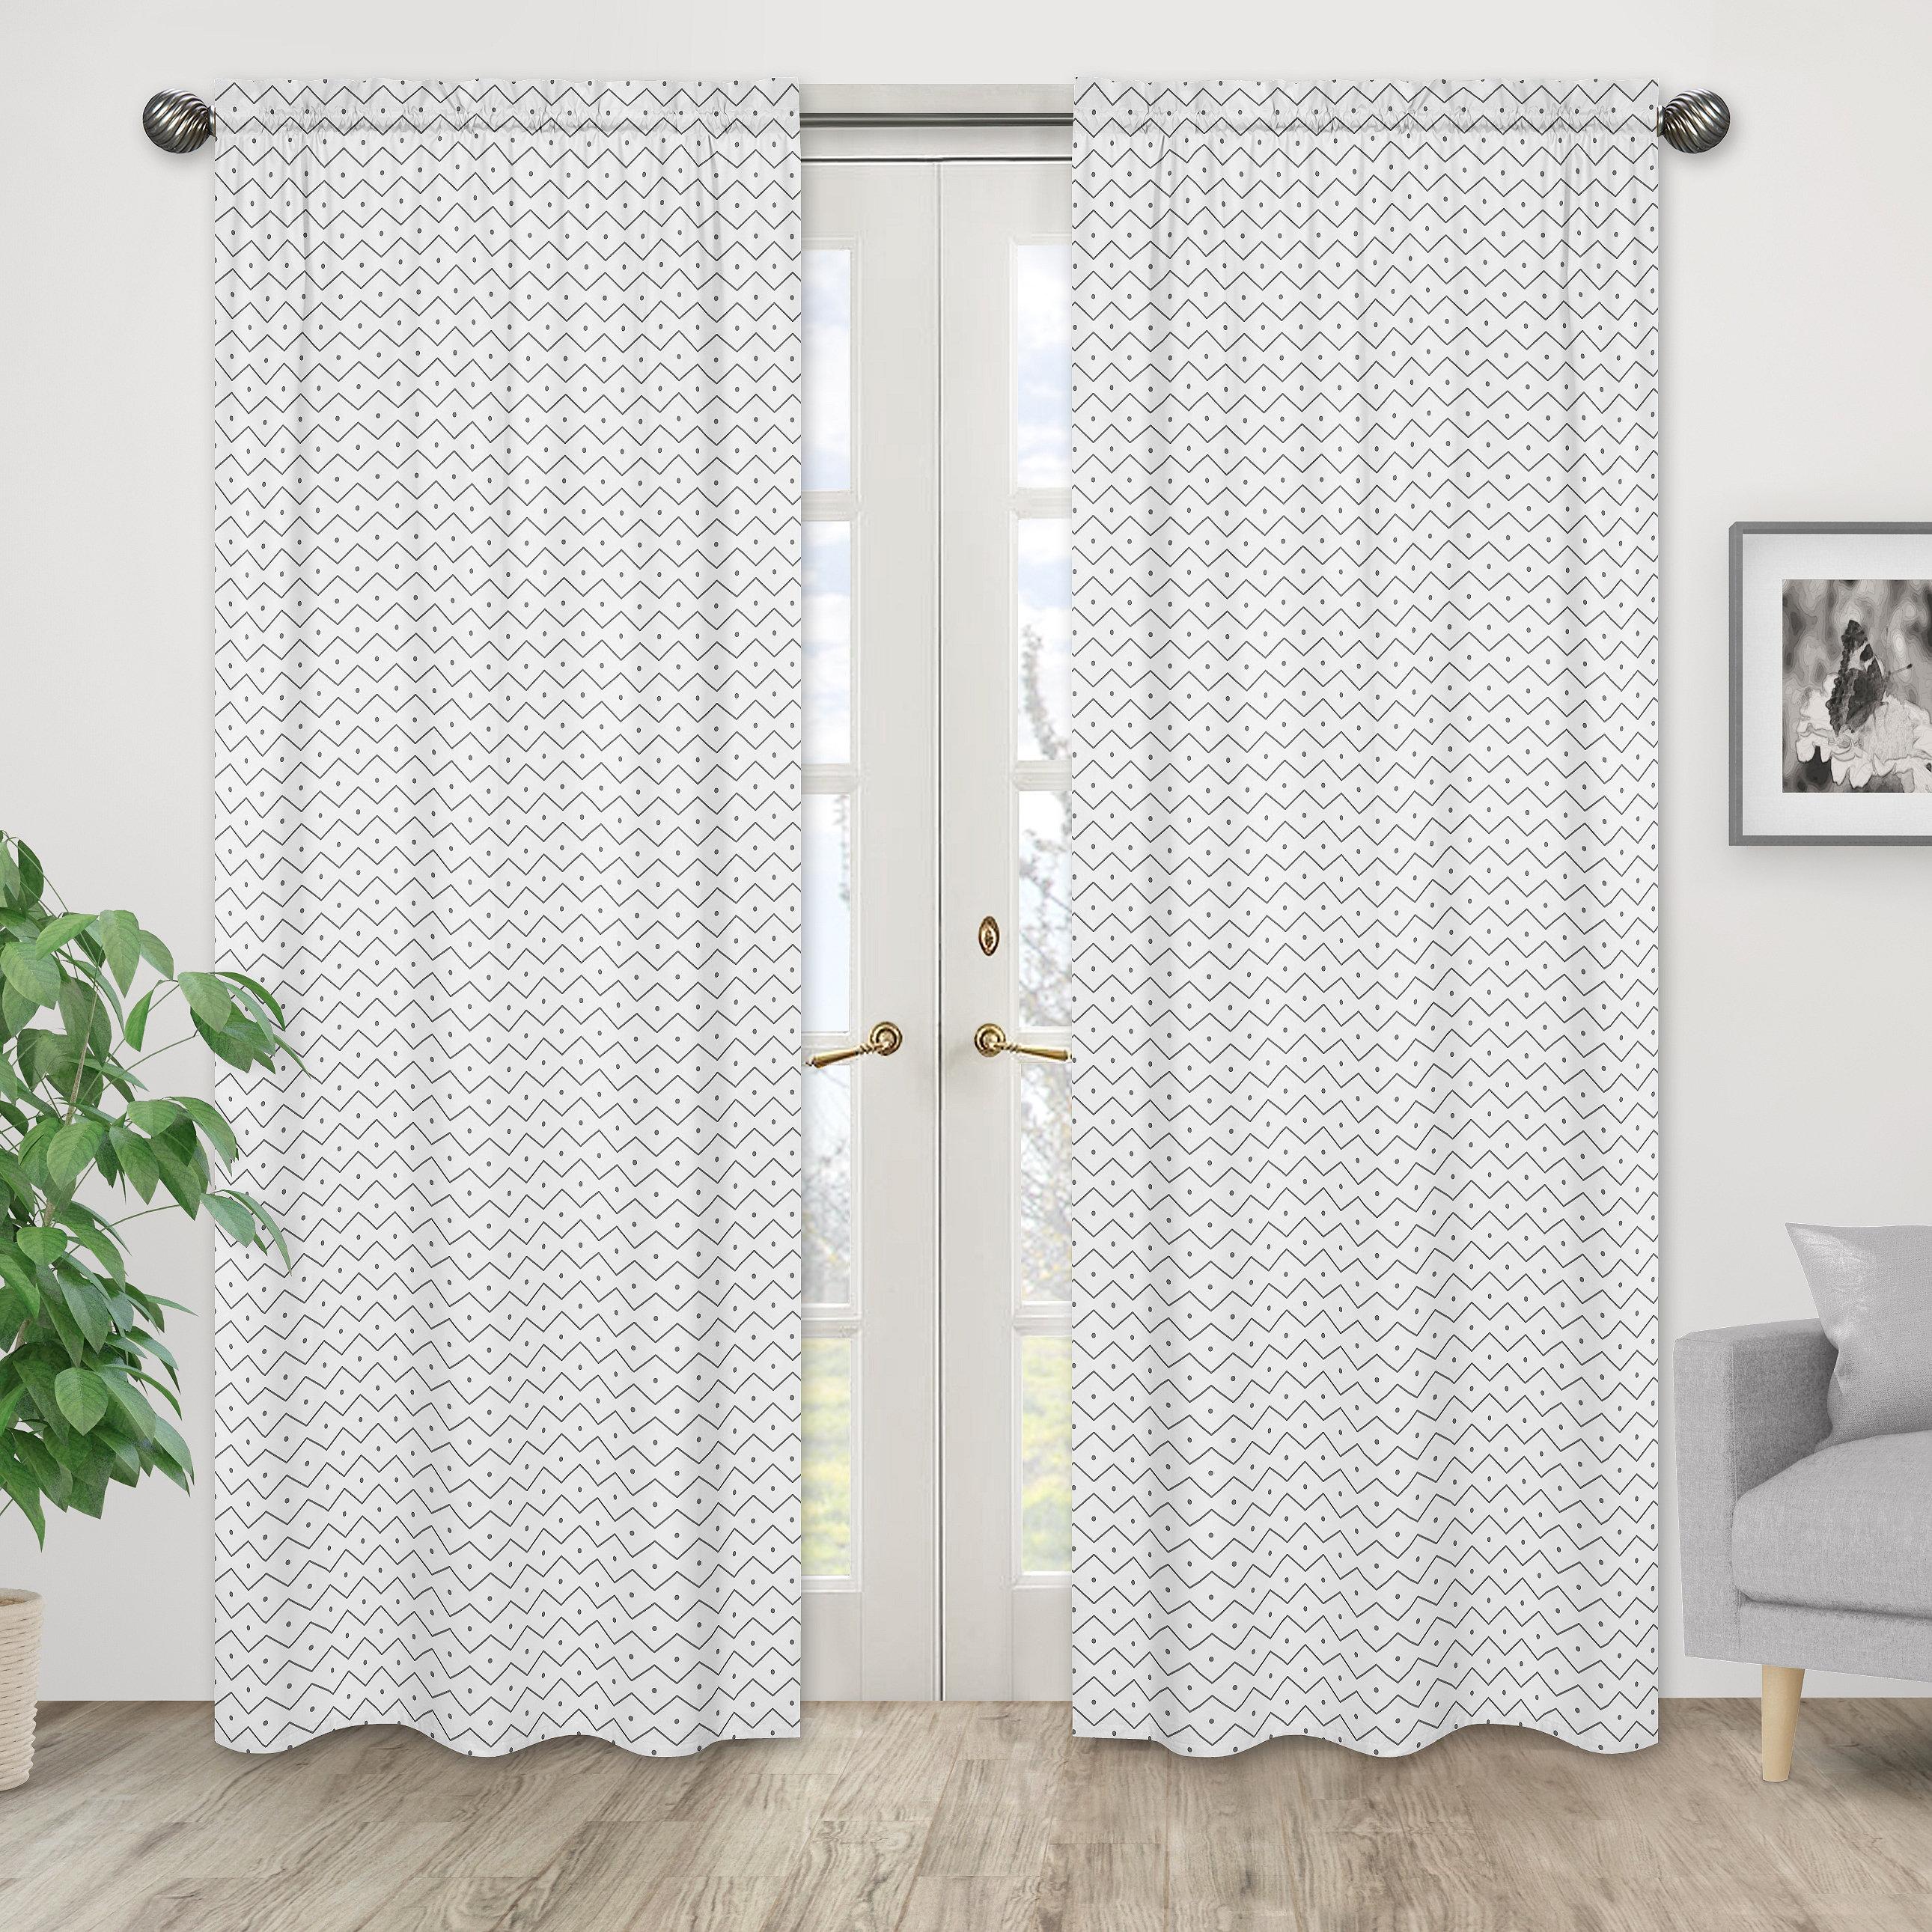 Sweet Jojo Designs Mod Dinosaur Chevron Semi Sheer Rod Pocket Curtain Panels Reviews Wayfair